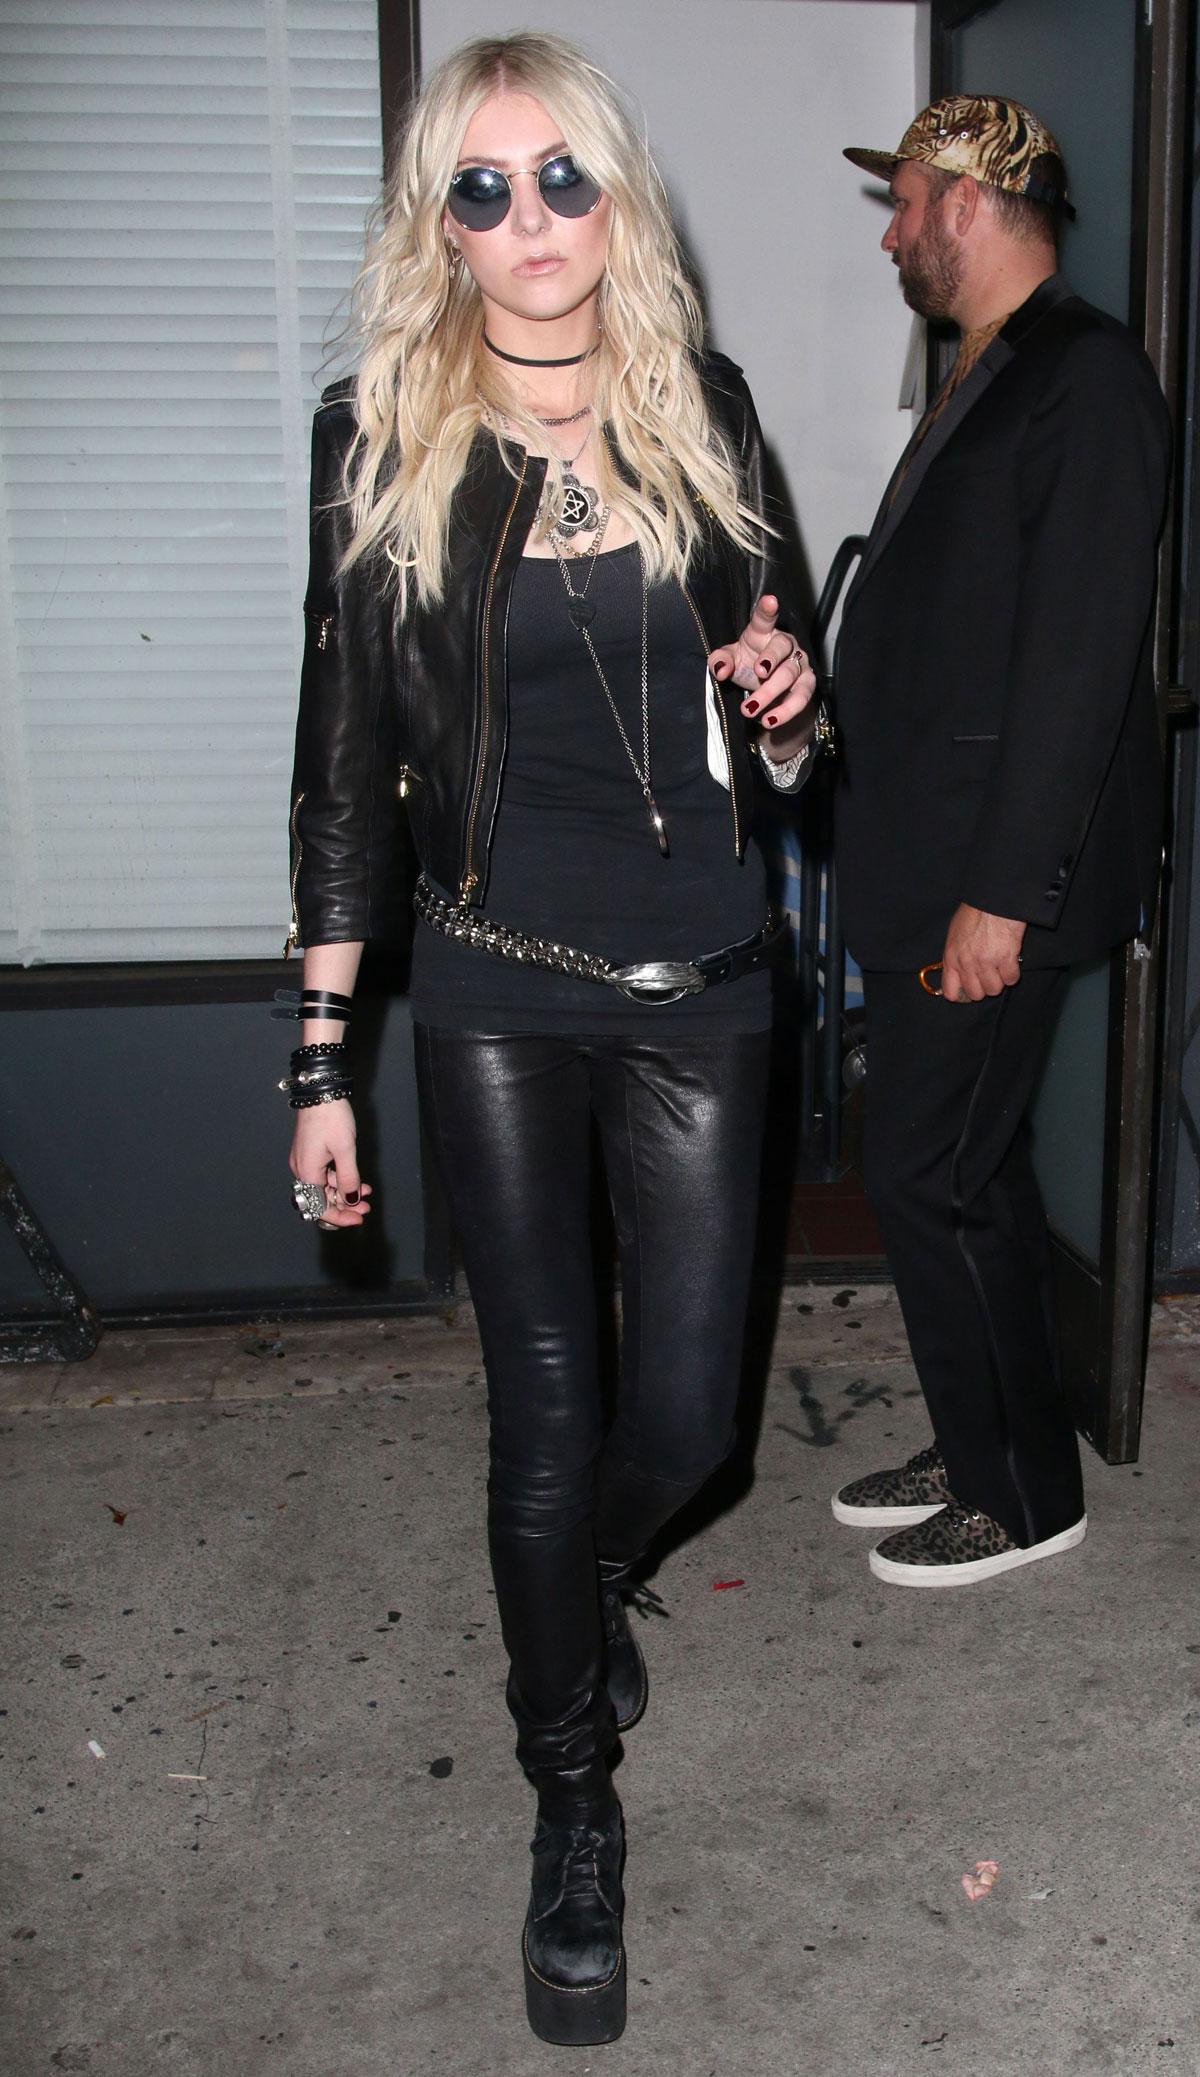 Taylor Momsen leaving Warwick Nightclub